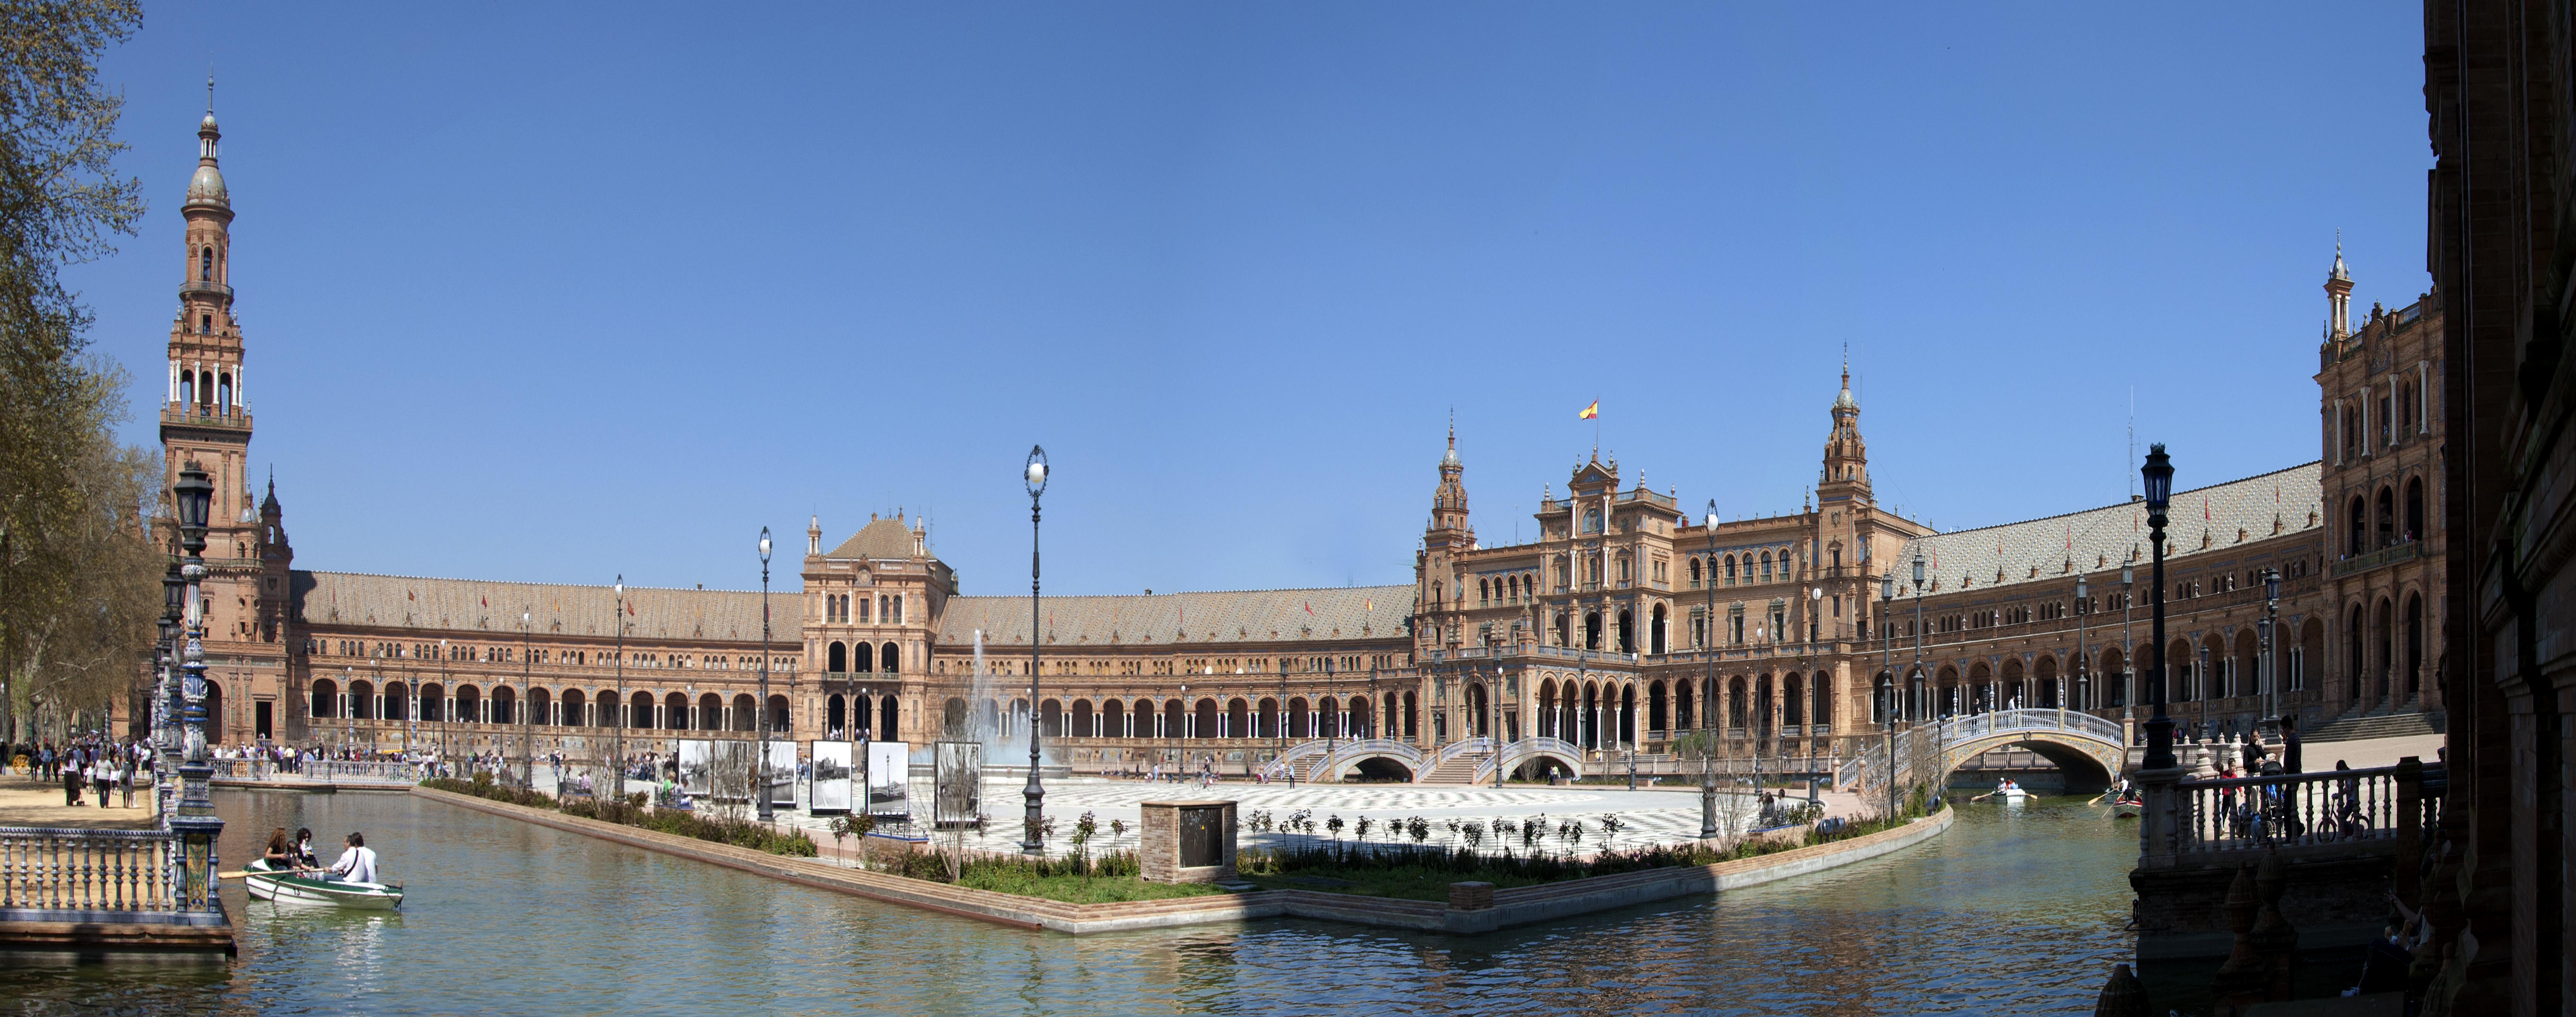 File:Sevilla Plaza de España 19-03-2011 13-36-19.jpg - Wikimedia Commons